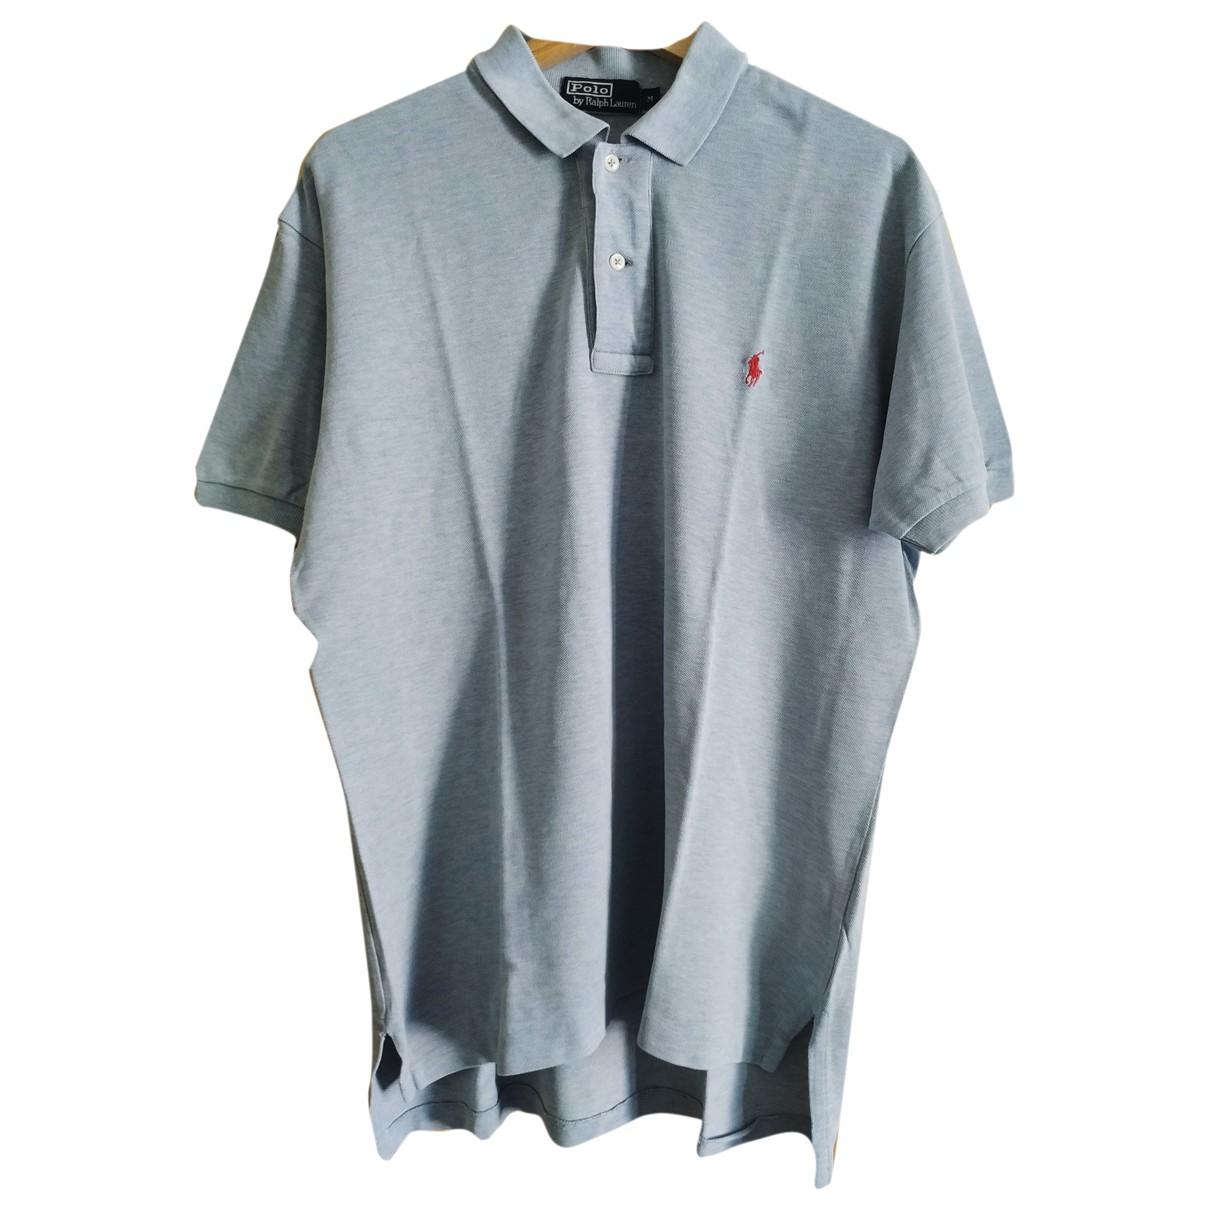 Polo Ralph Lauren Polo classique manches courtes Poloshirts in  Grau Baumwolle